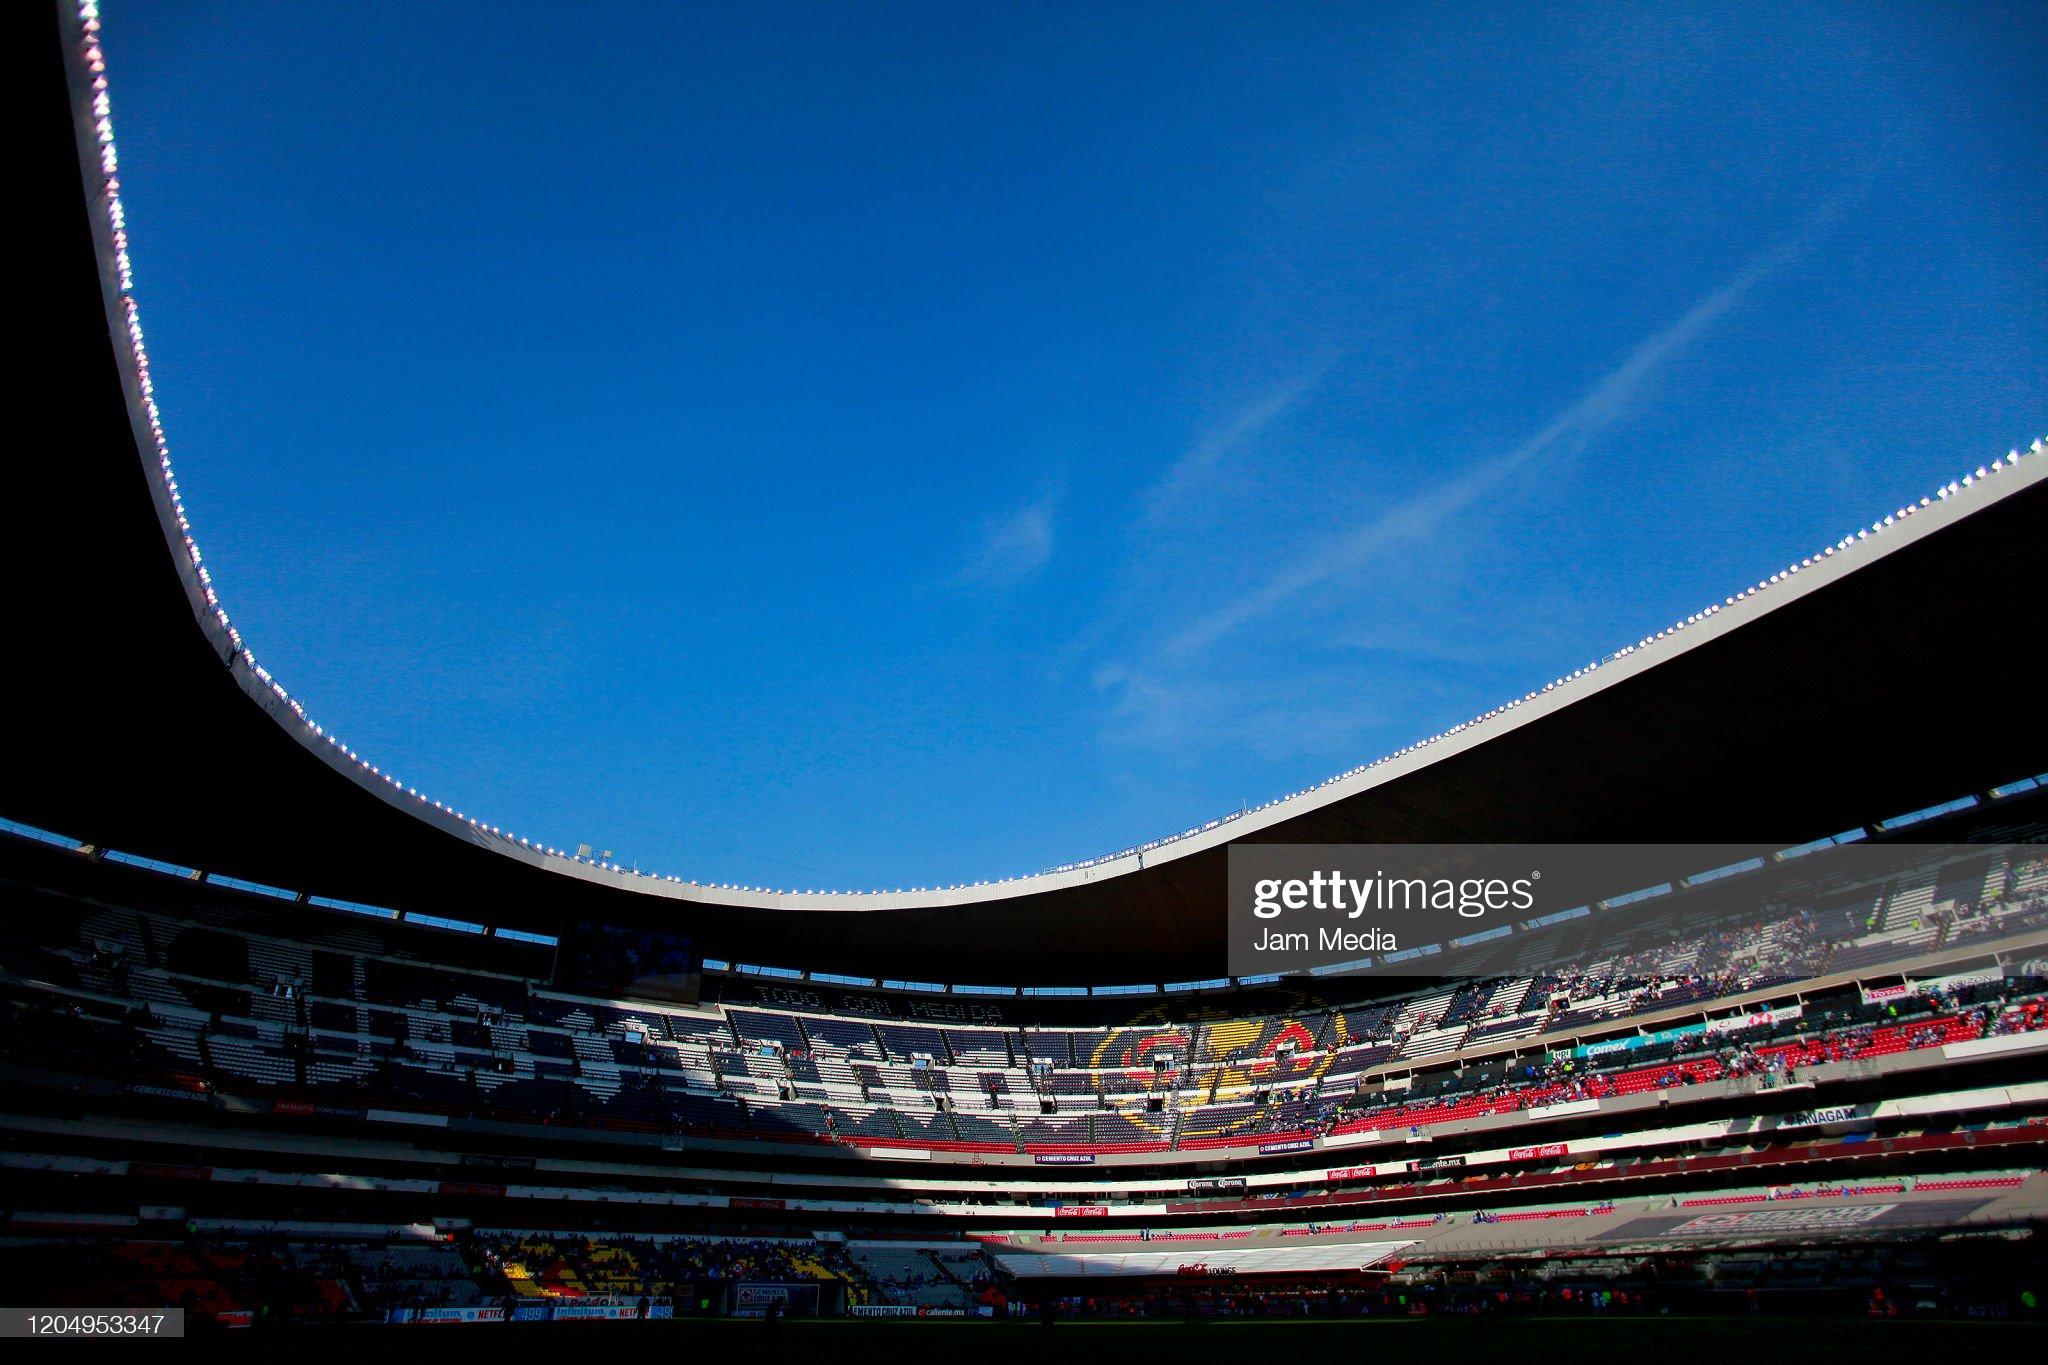 Club America v Cruz Azul Preview, prediction and odds